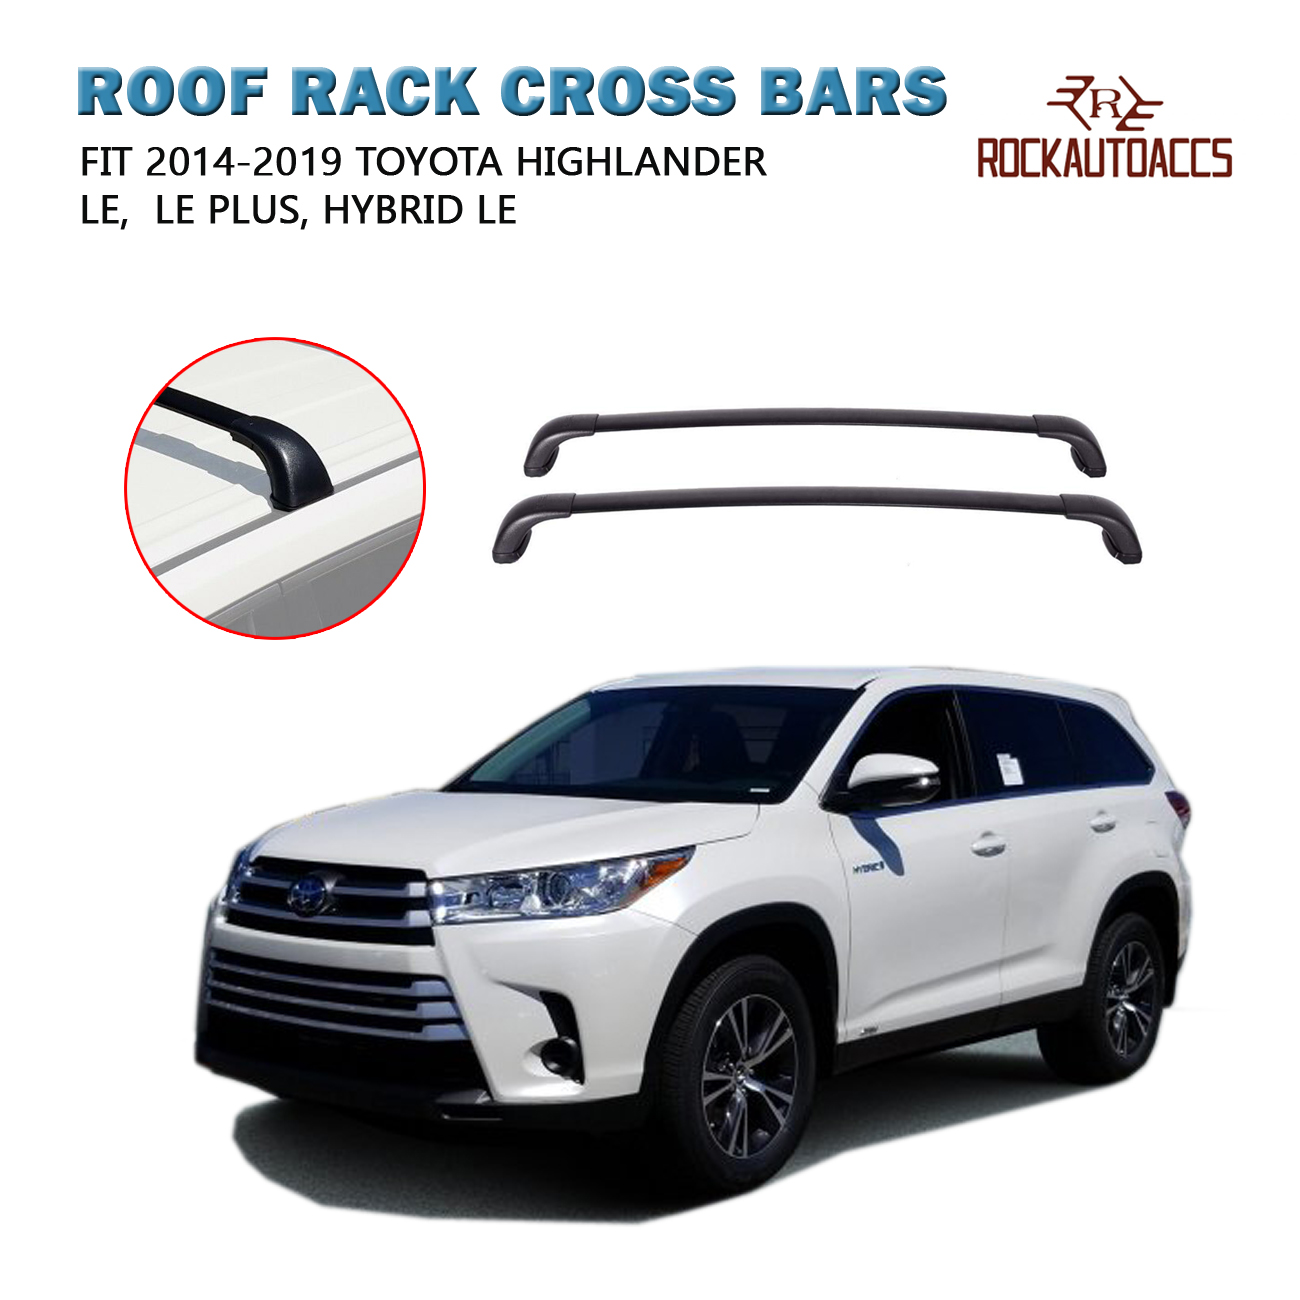 rokiotoex roof rack crossbars fit 2014 2019 toyota highlander le plus hybrid le side rails cross bars cargo box carrier bike rack kayak rack ski